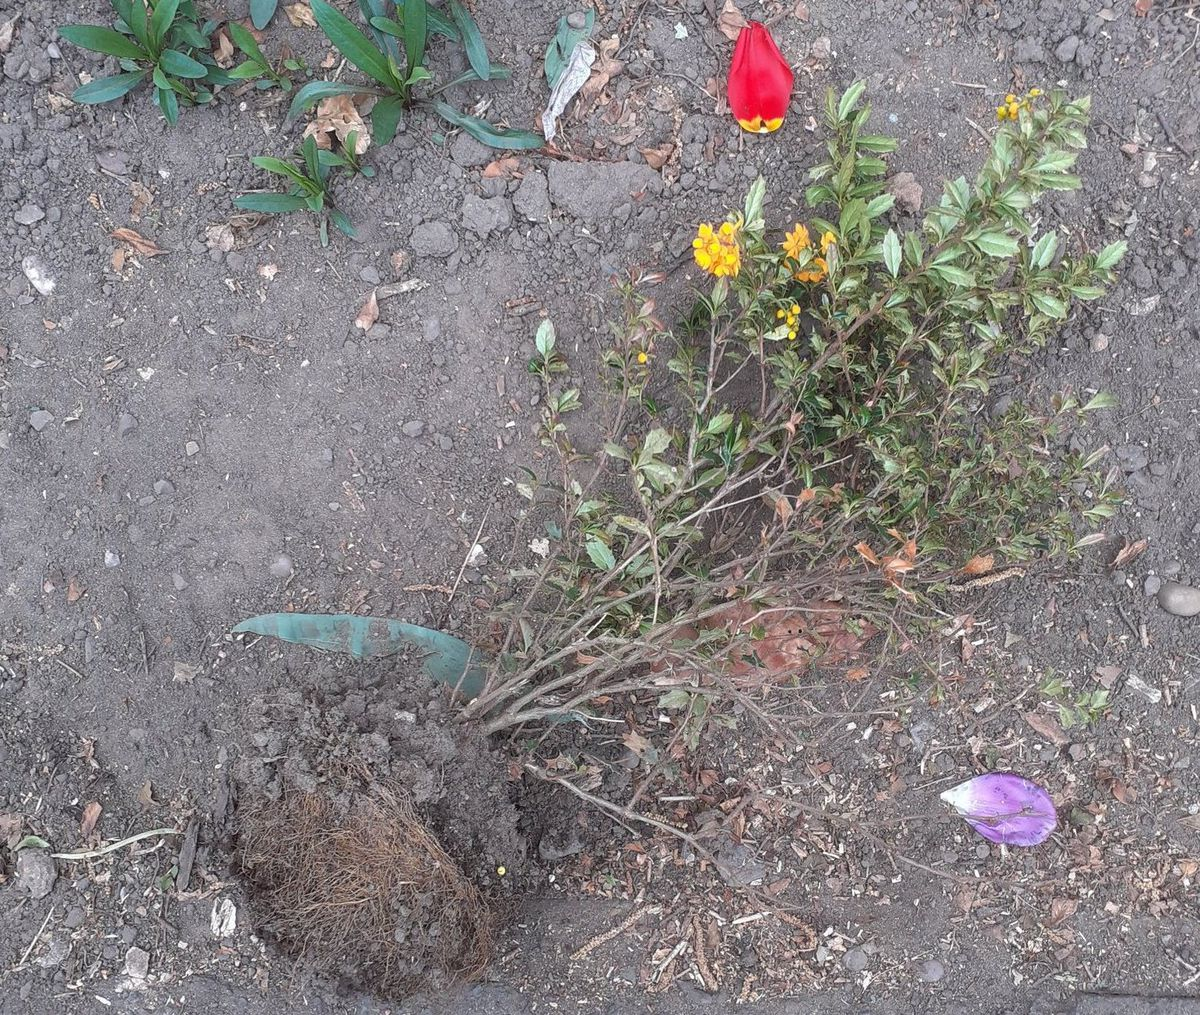 The vandalised flowers